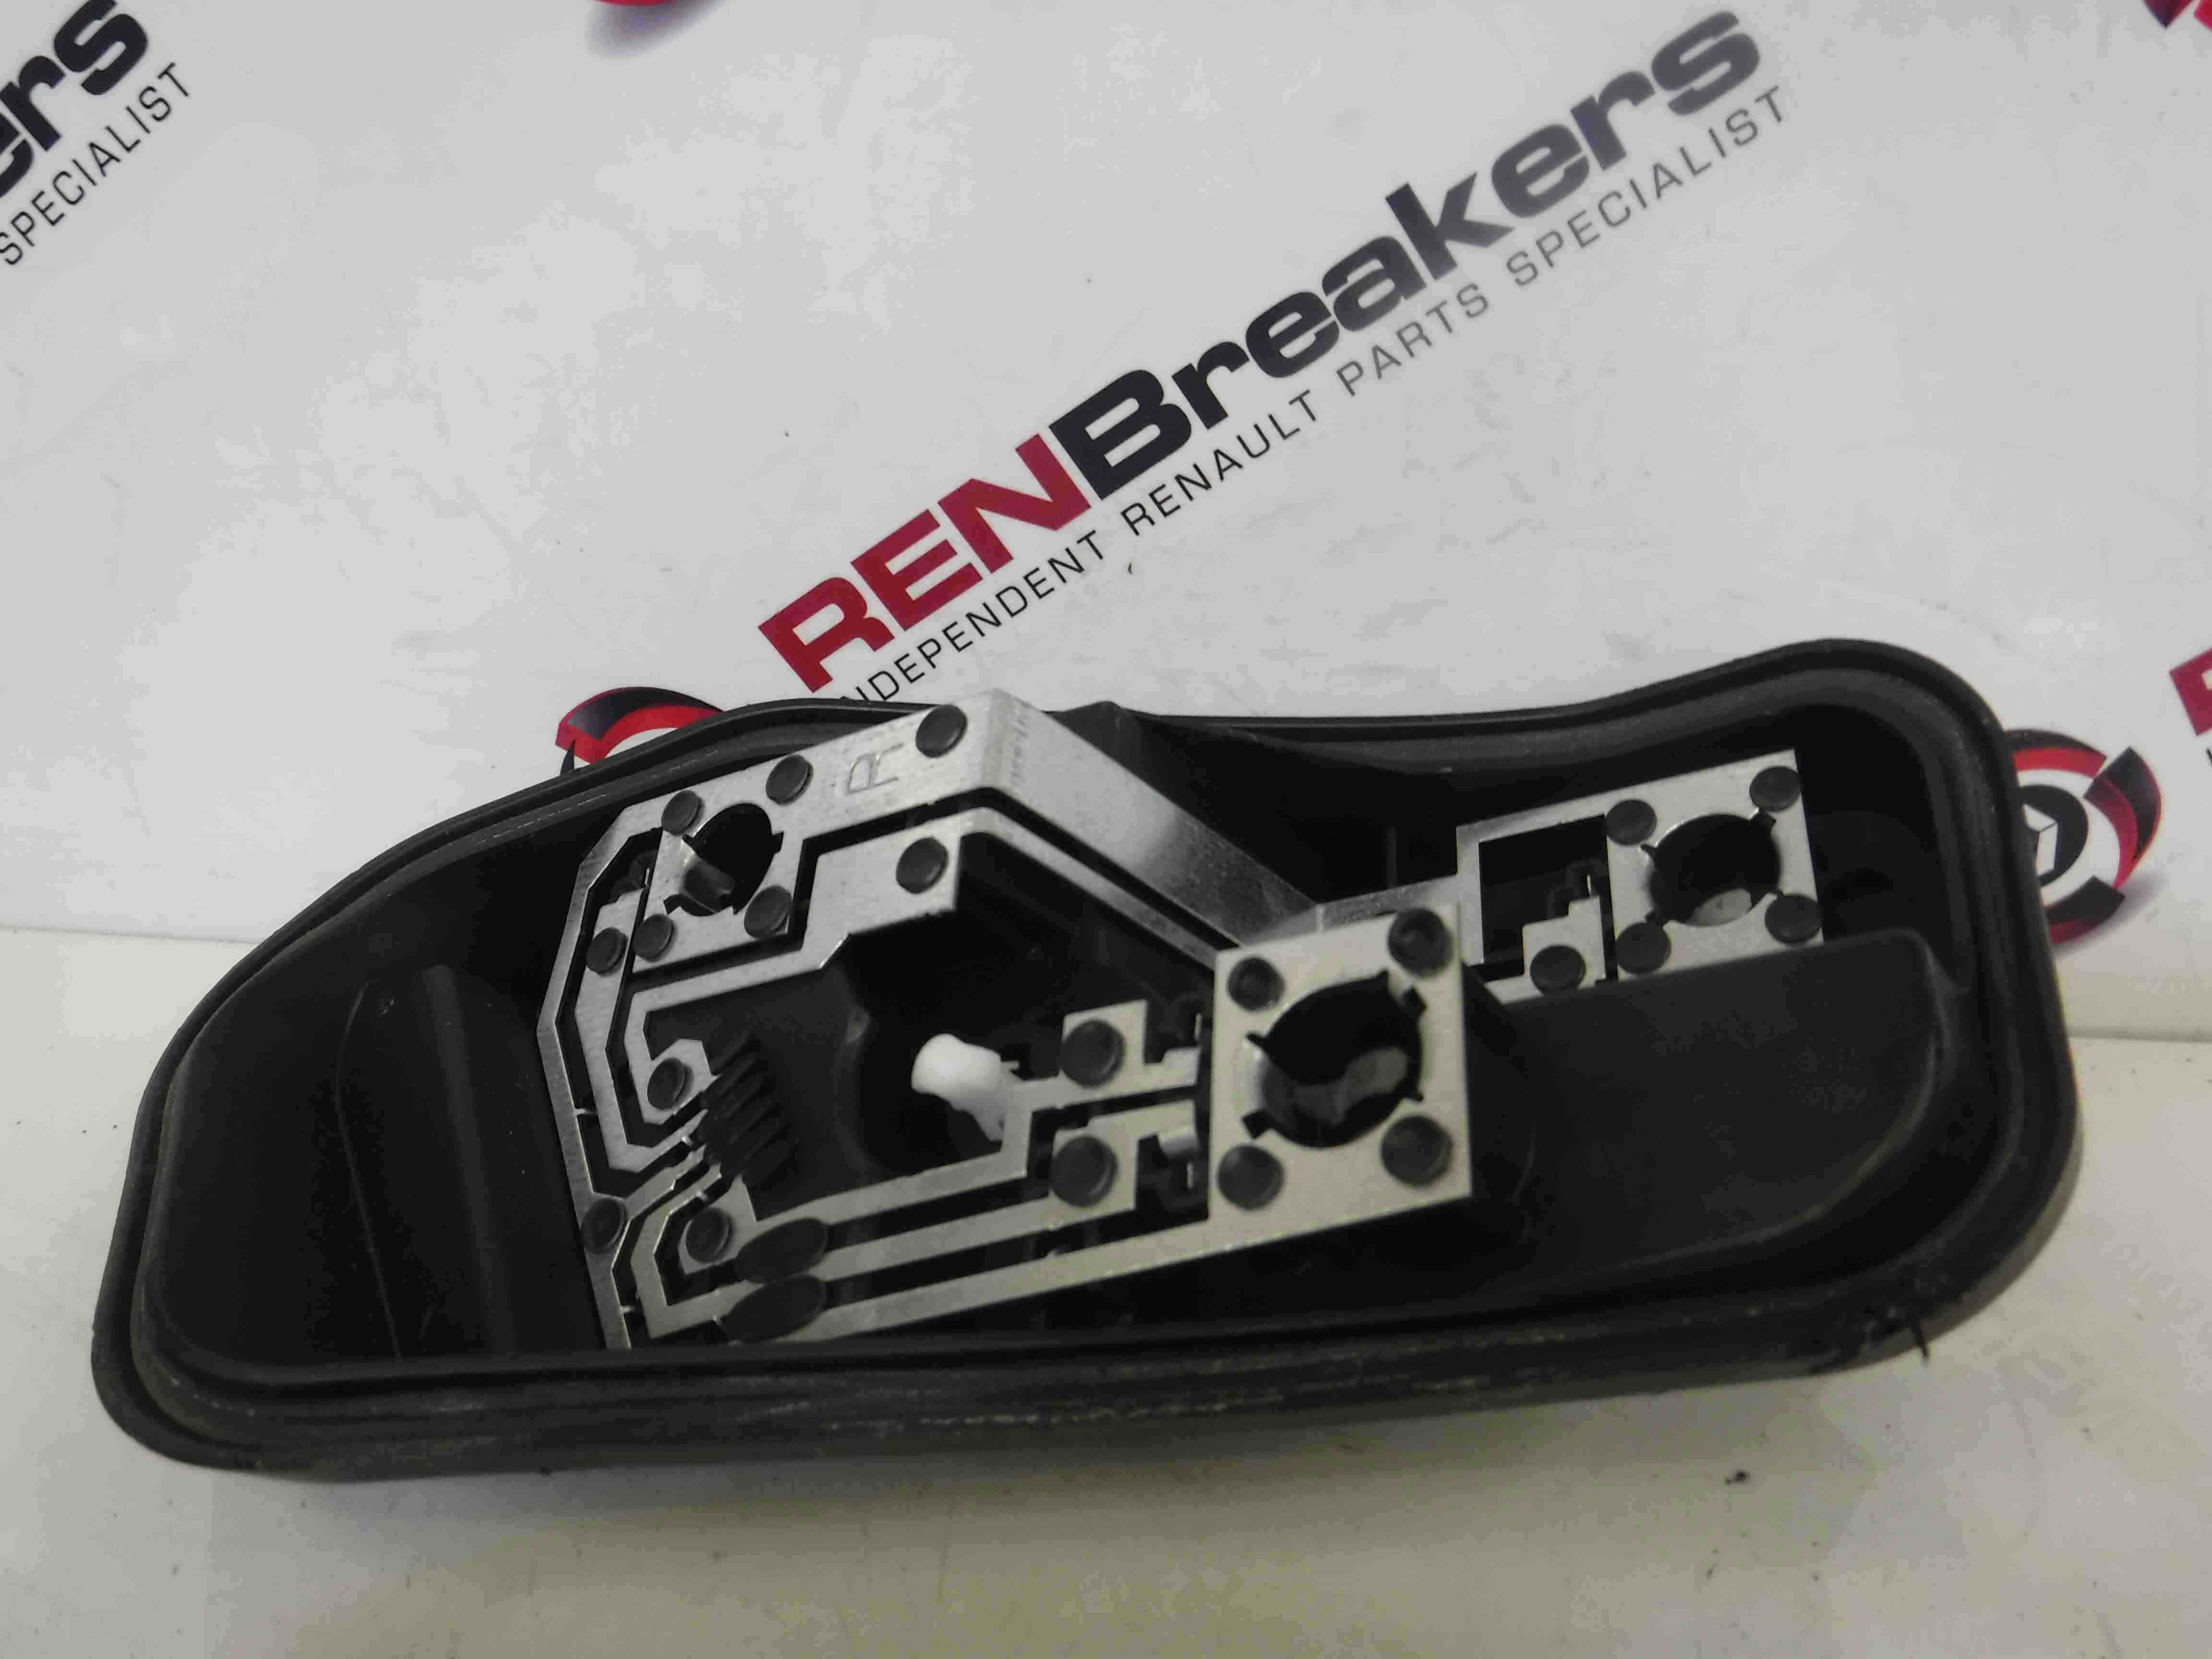 Renault Megane 2006-2008 Drivers OSR Rear Light Bulb Holder 89036896